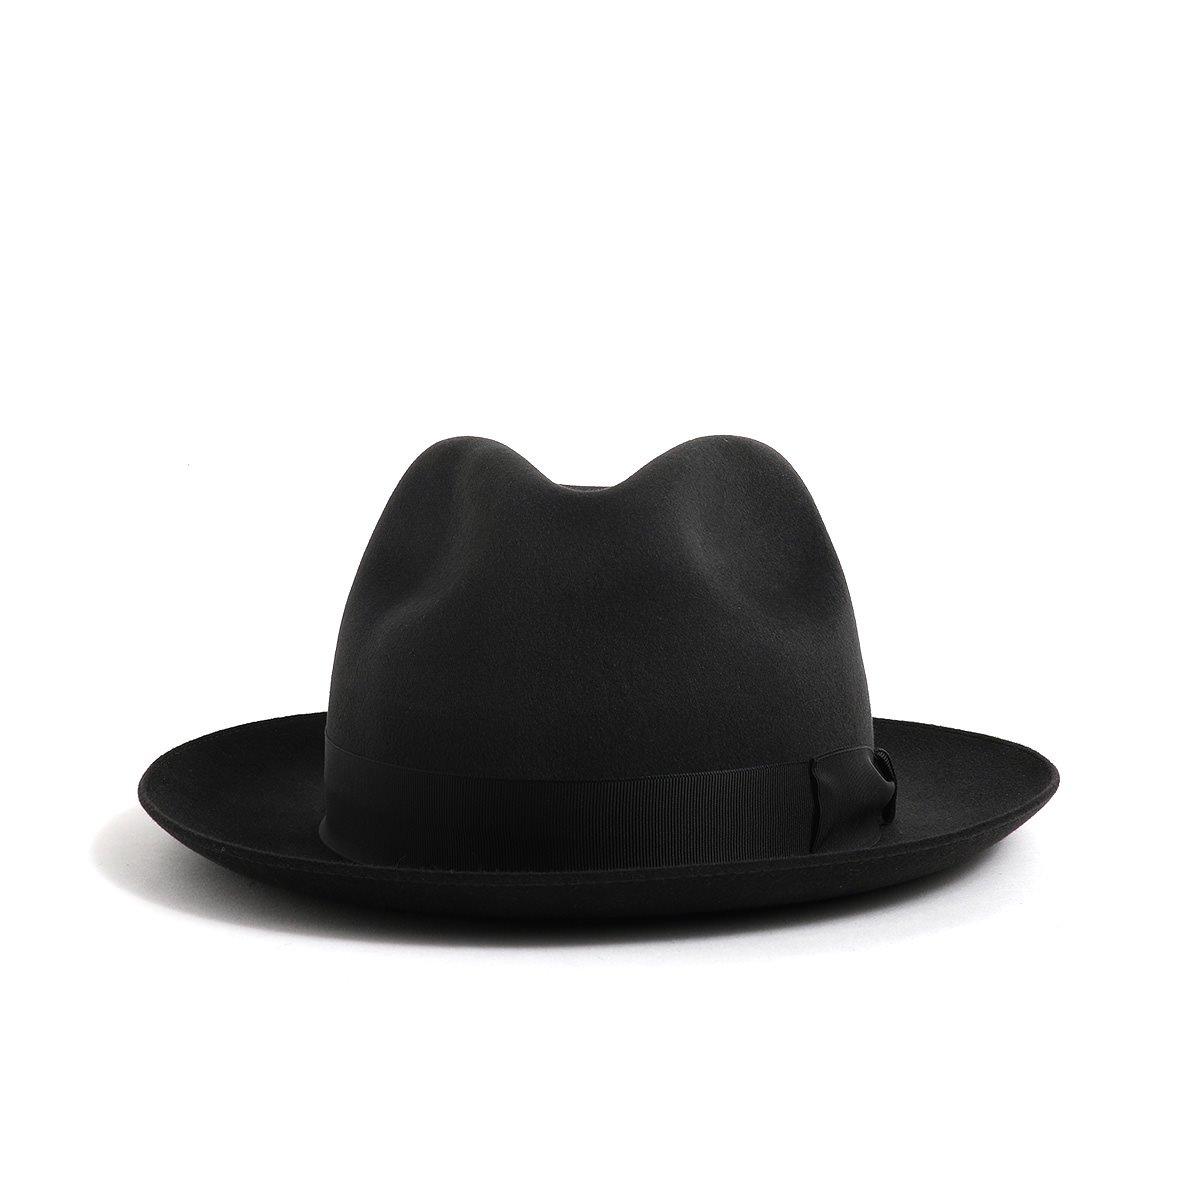 Rohw master product by Tesi AVAN FUR FELT HAT 詳細画像2